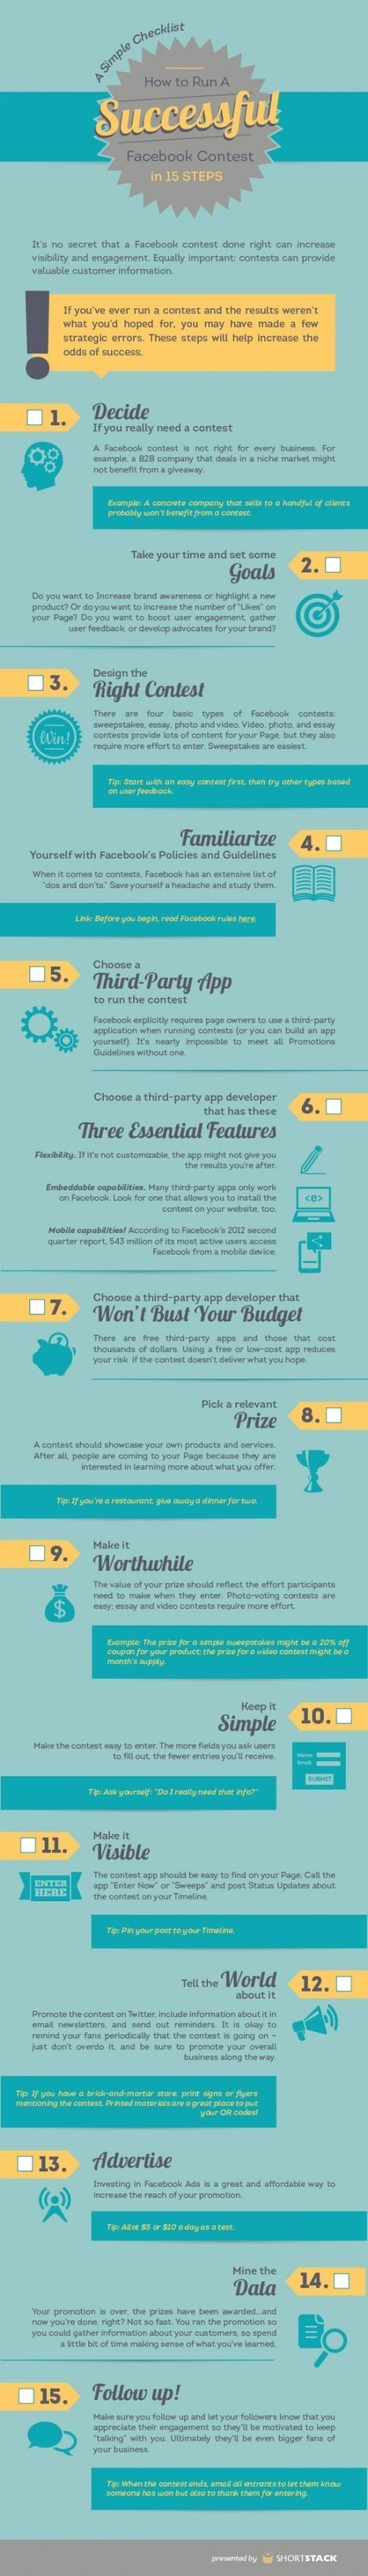 Comment lancer un concours Facebook? [Infographie] - Emarketinglicious | SOCIAL MEDIA STRATEGIST BY LEILA | Scoop.it